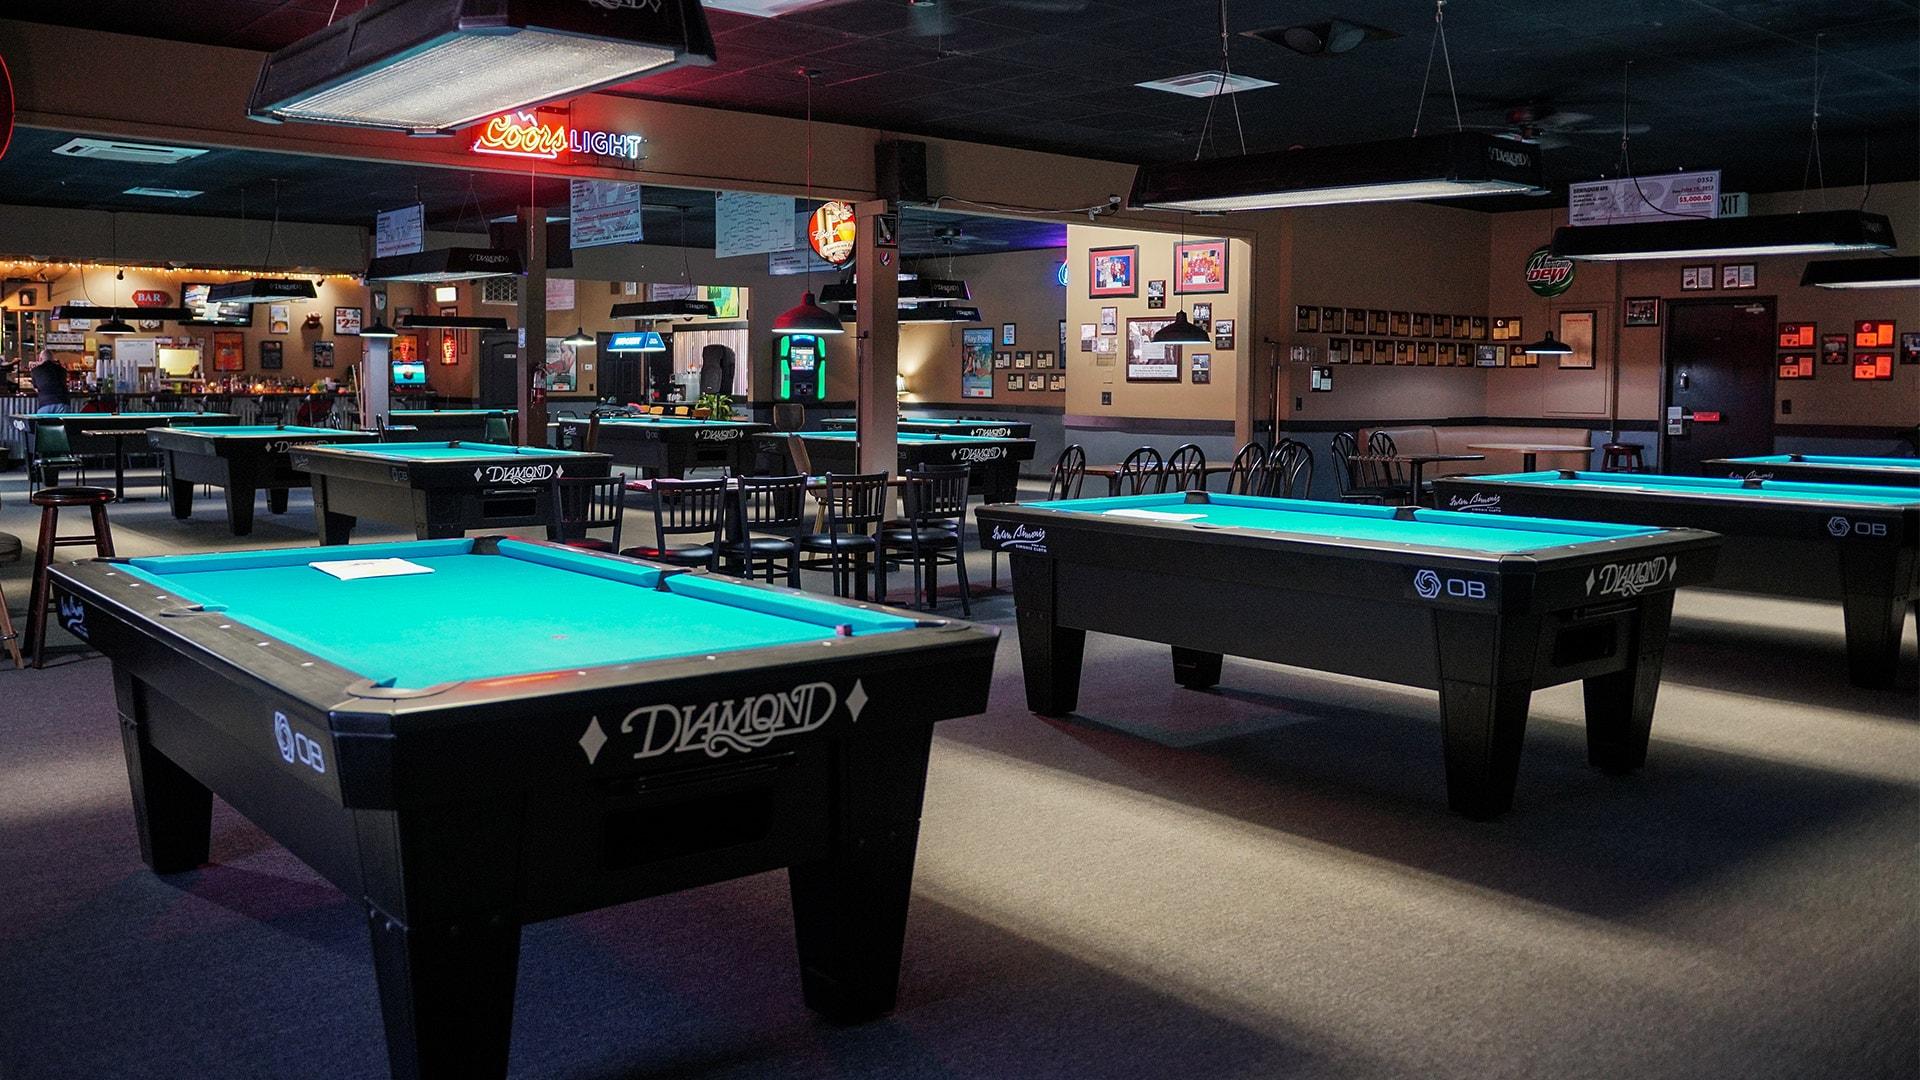 Diamond pool tables at Poppa G's Billiards - Birmingham, Pelham, AL